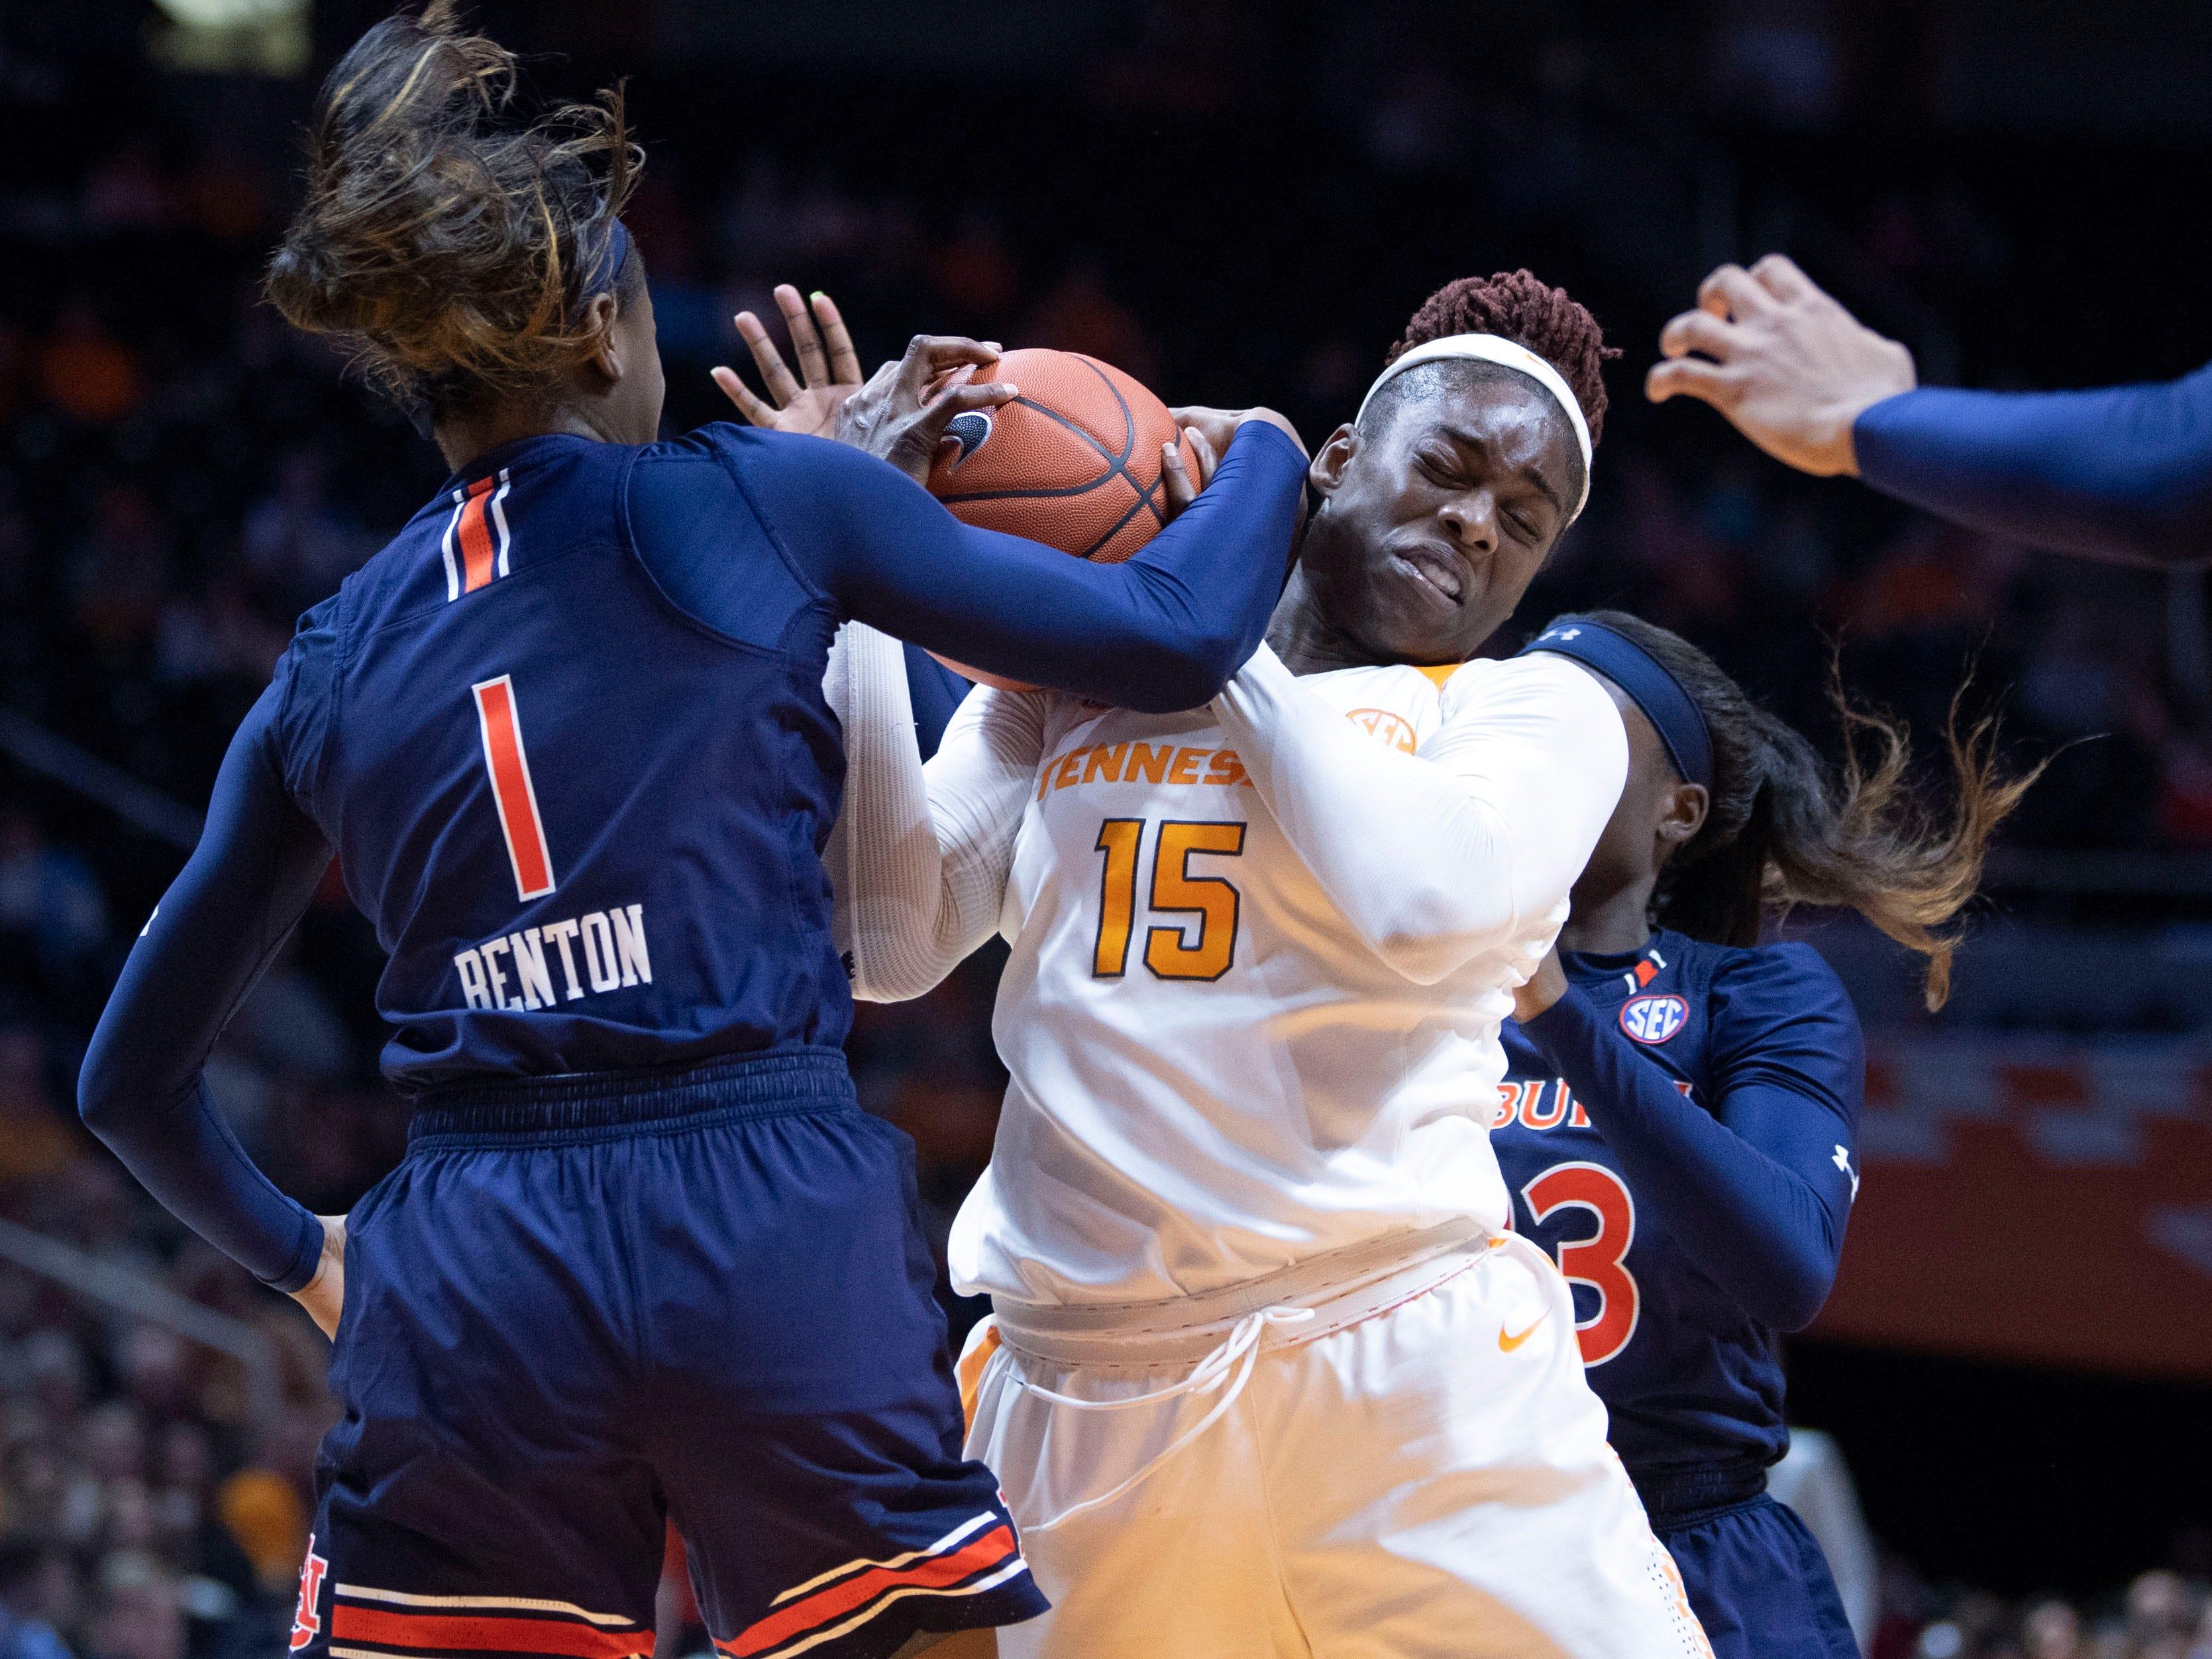 Tennessee's Cheridene Green (15) fights Auburn's Robyn Benton (1) for the ball on Thursday, February 14, 2019.